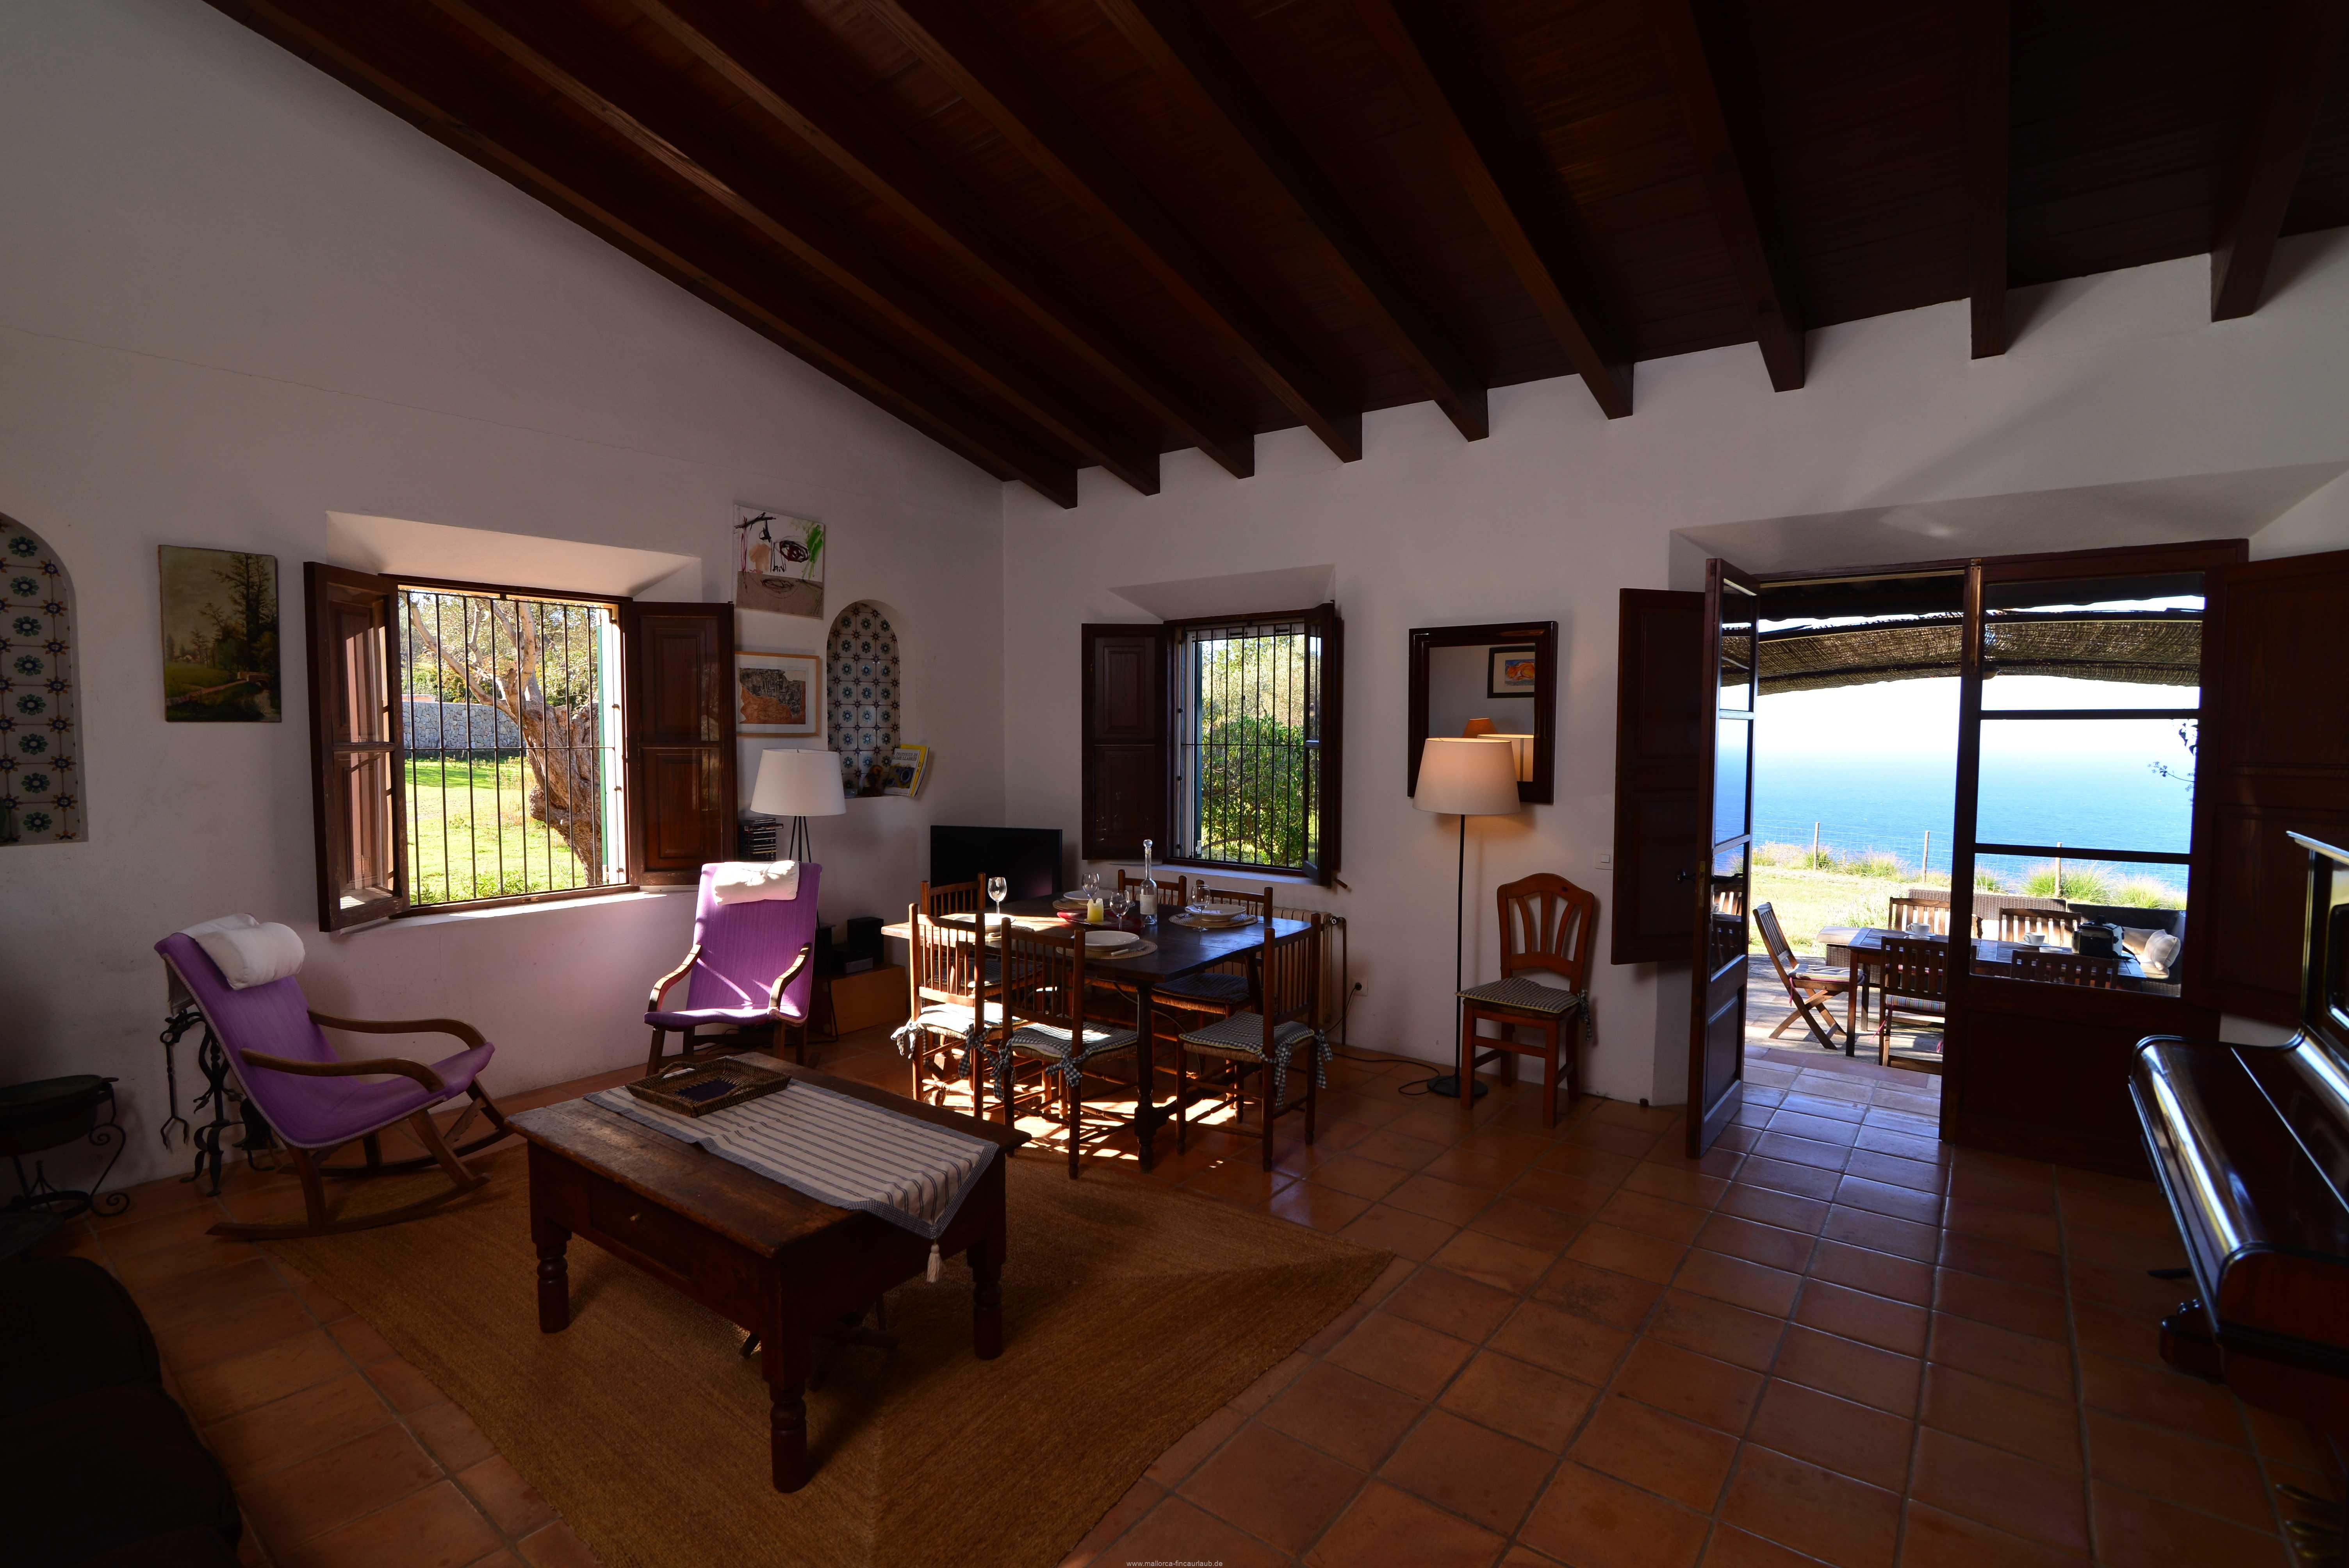 Foto der Wohnung MAL-40-511-01-finca-vidal-deia-valldemossa-wohnraum.JPG